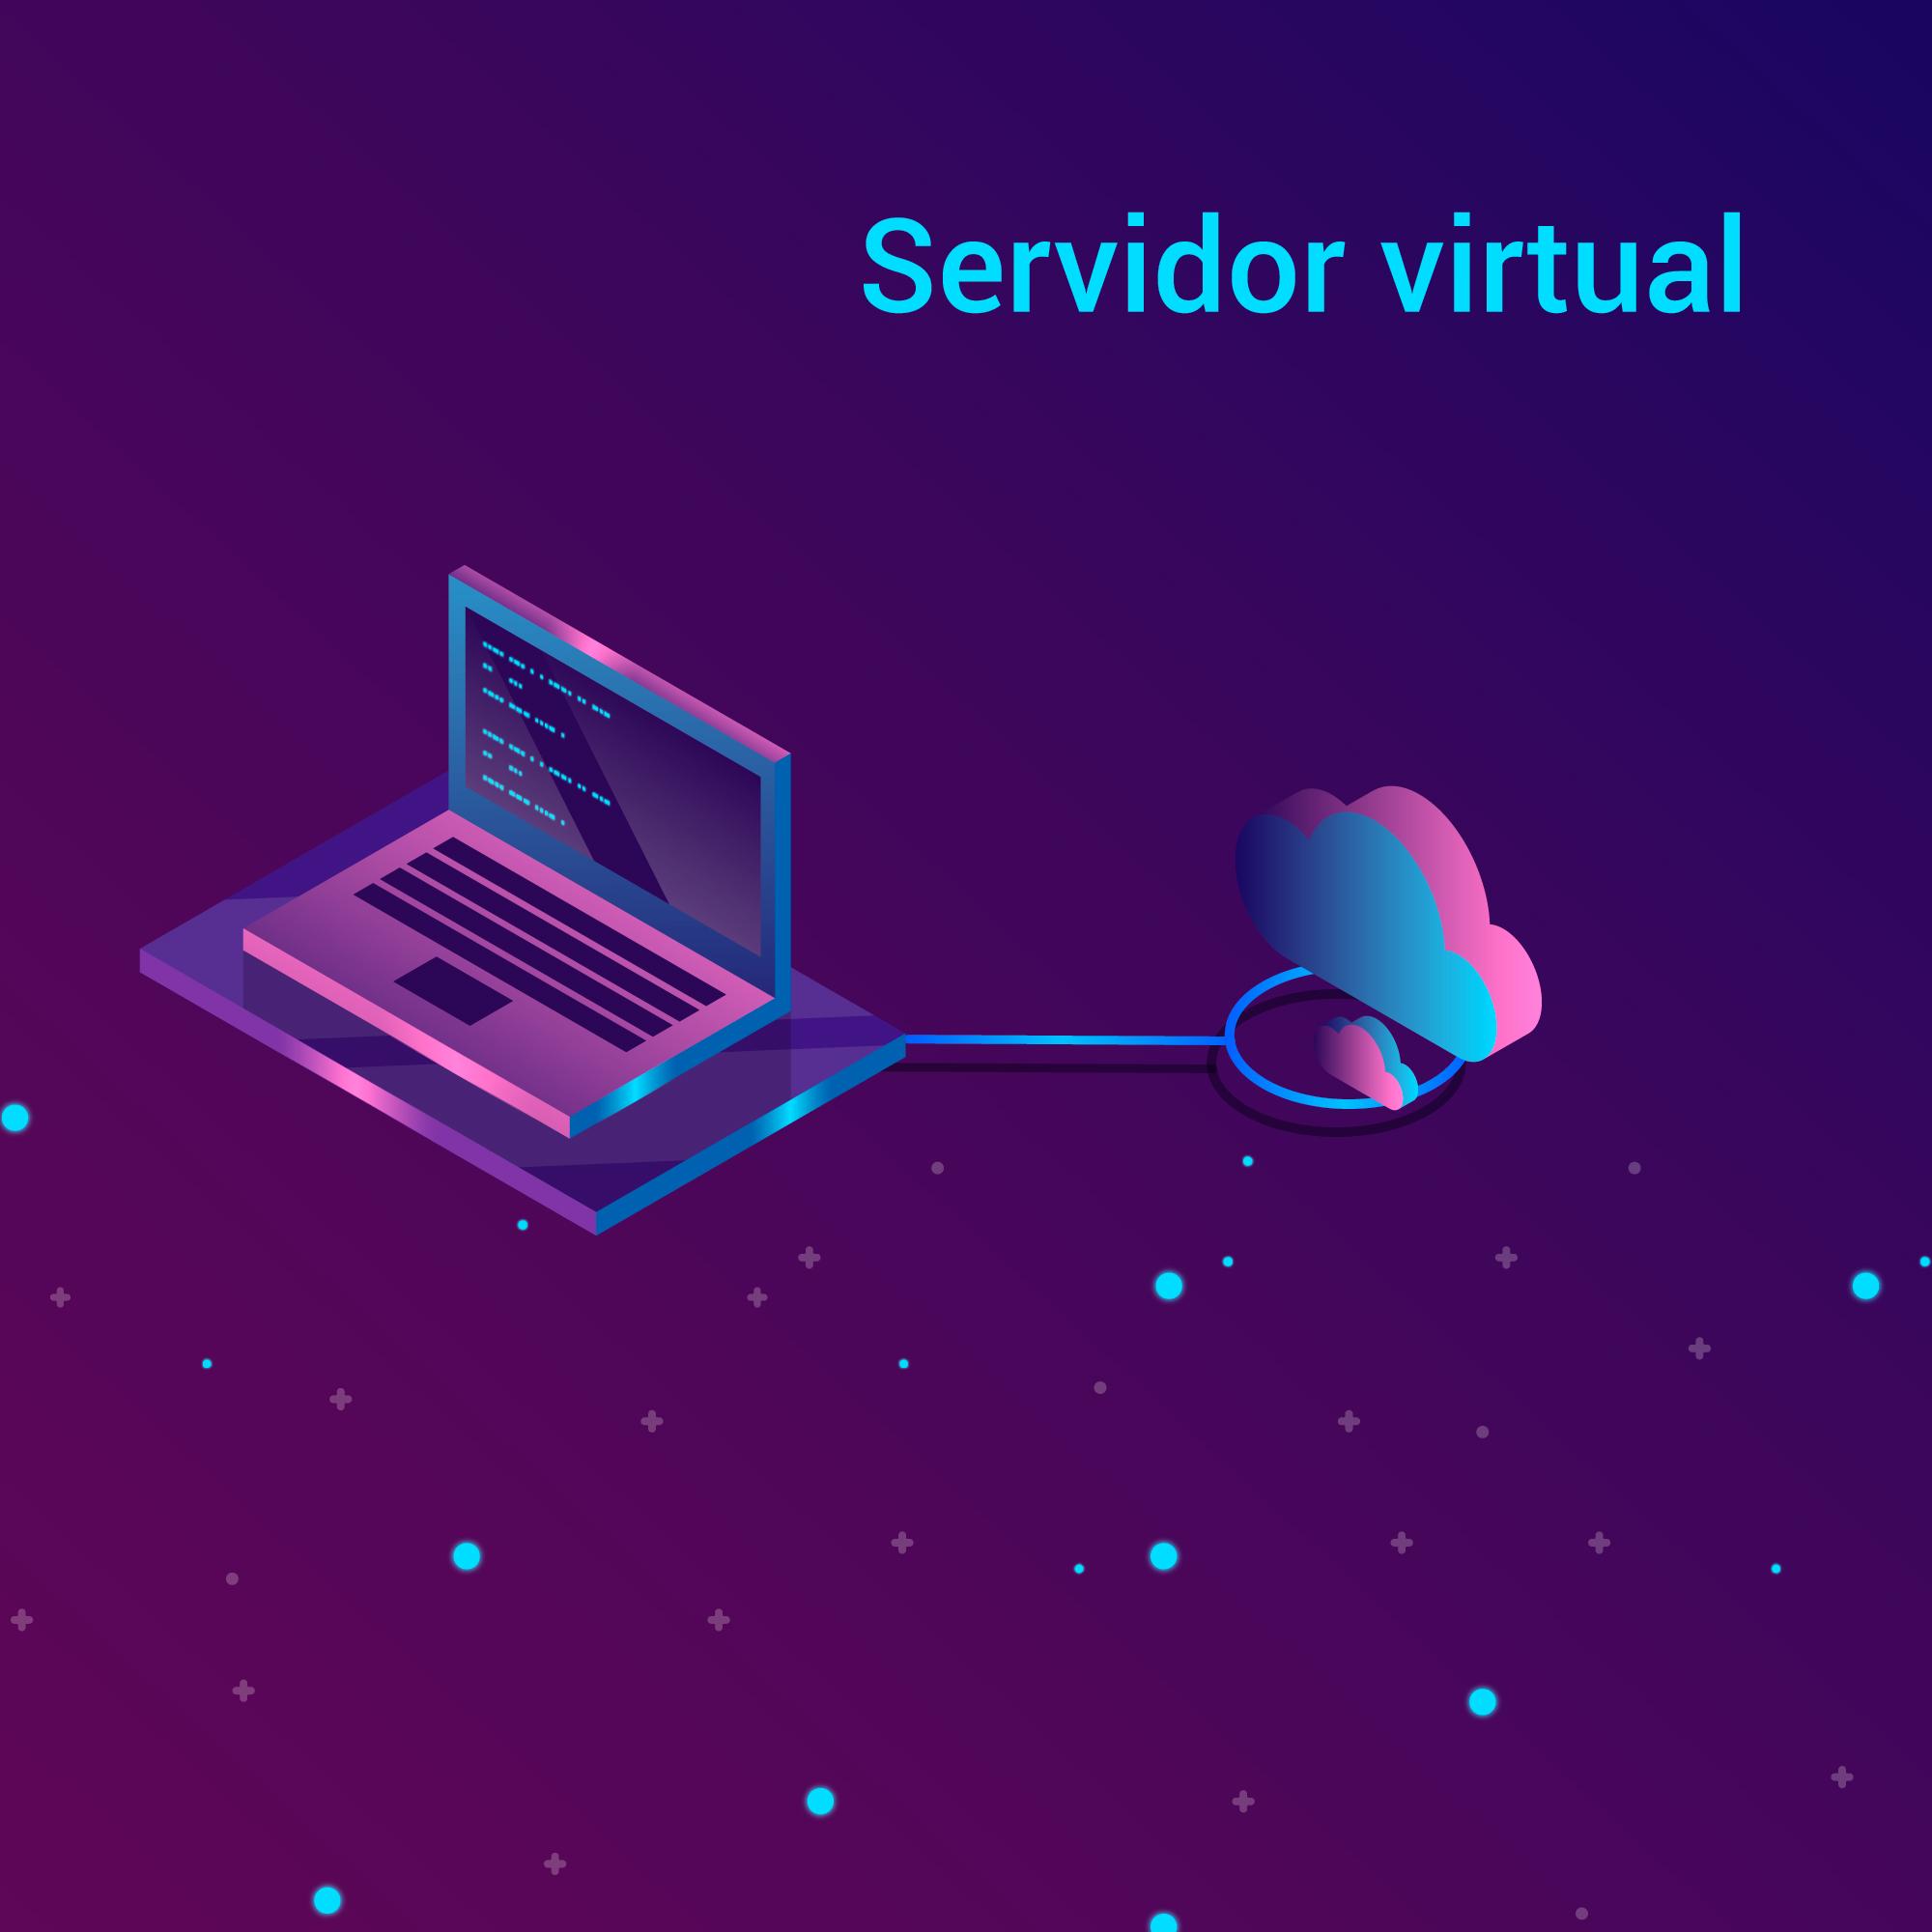 Imagem servidor virtual